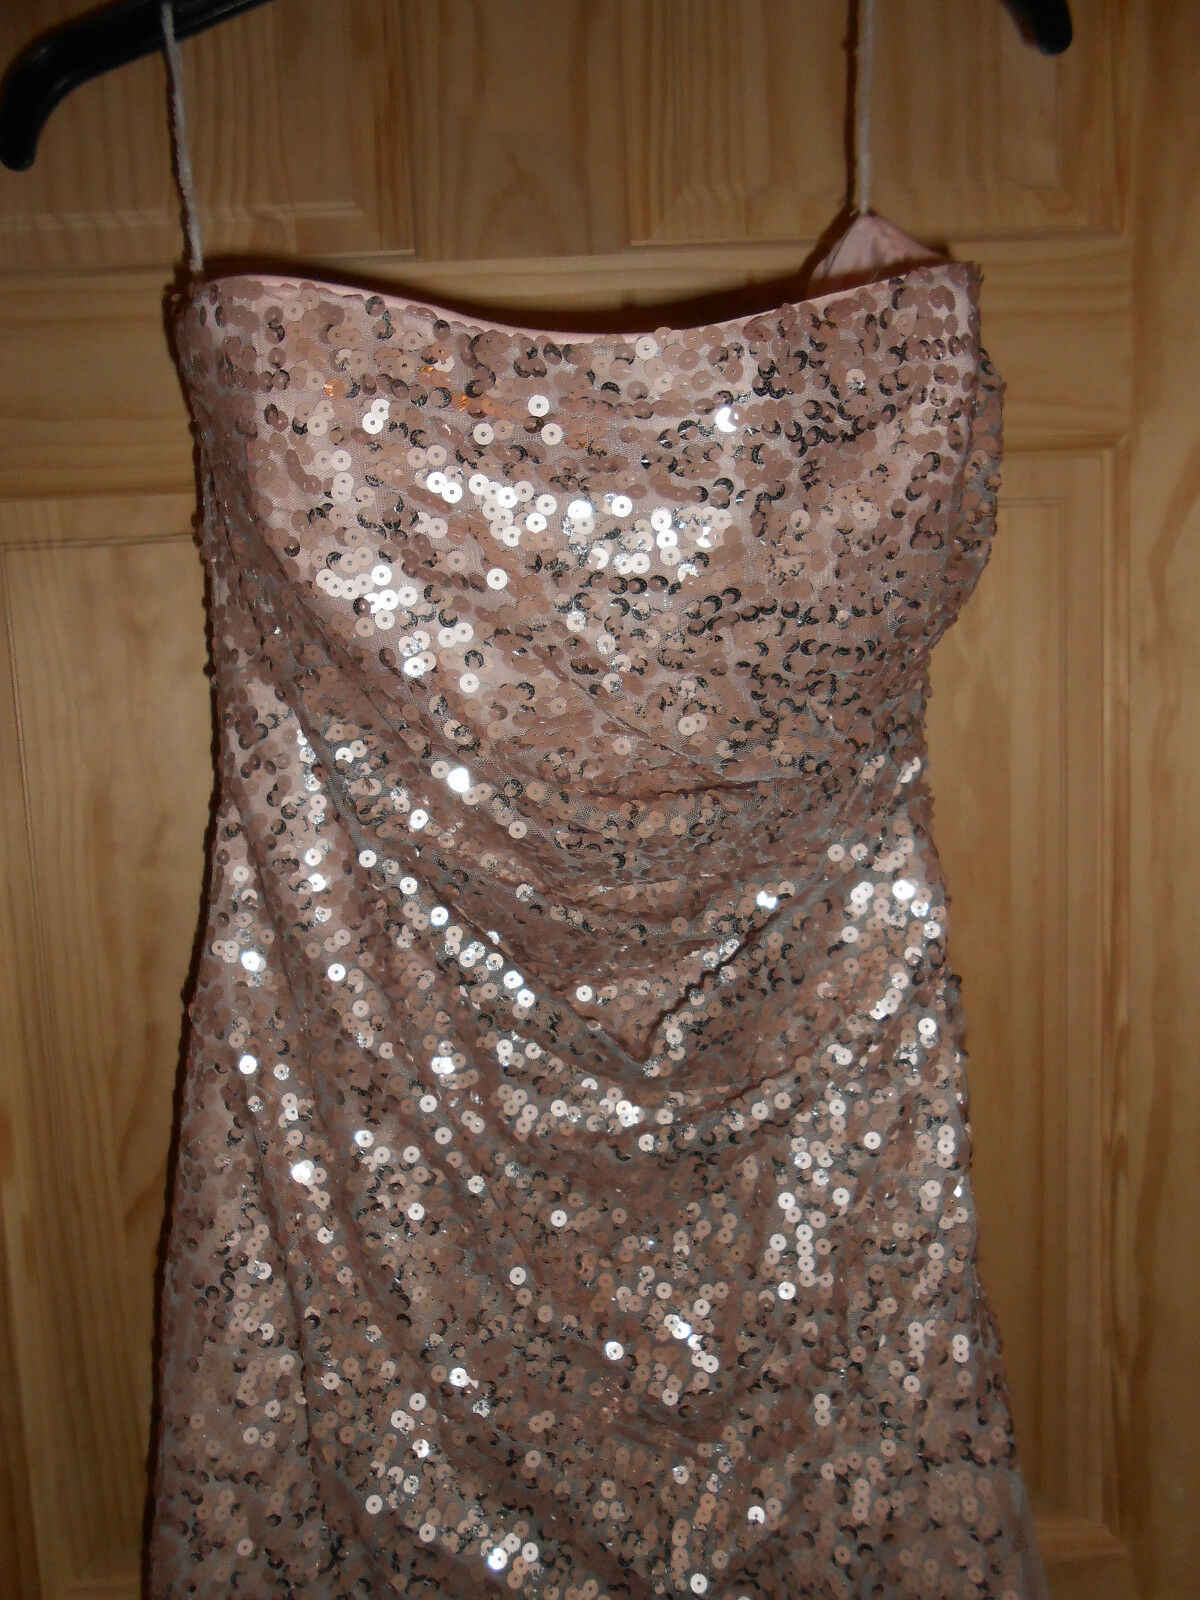 NEW deb Long Formal Nude Pink Tan Tulle Sequins Sequins Sequins Dress Strapless sz 13 14 Elegant 8c25fe